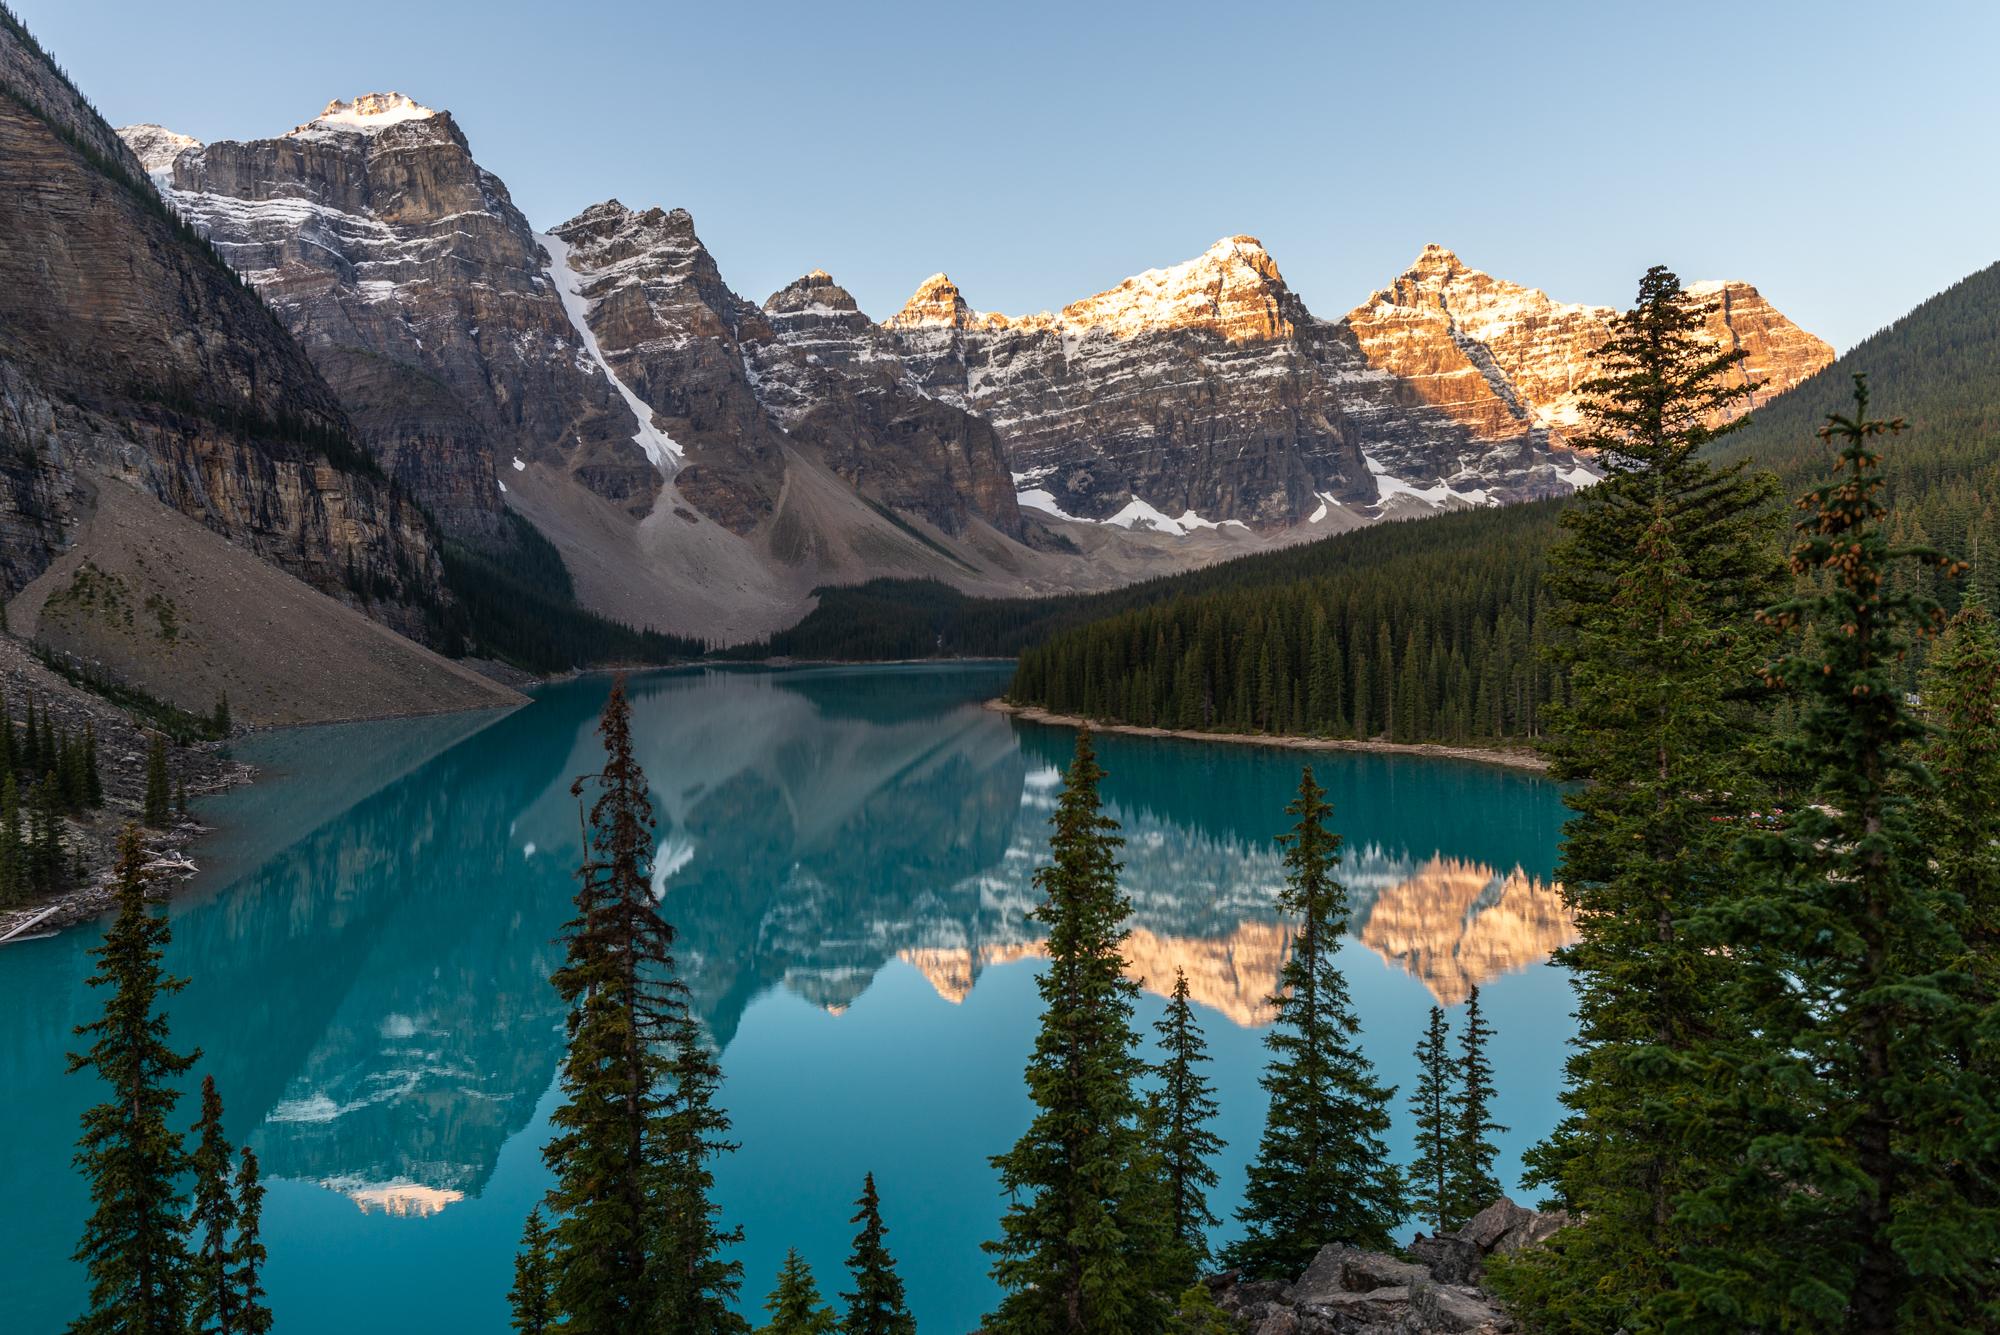 Banff National Park 2018 - Banff, Alberta, Canada